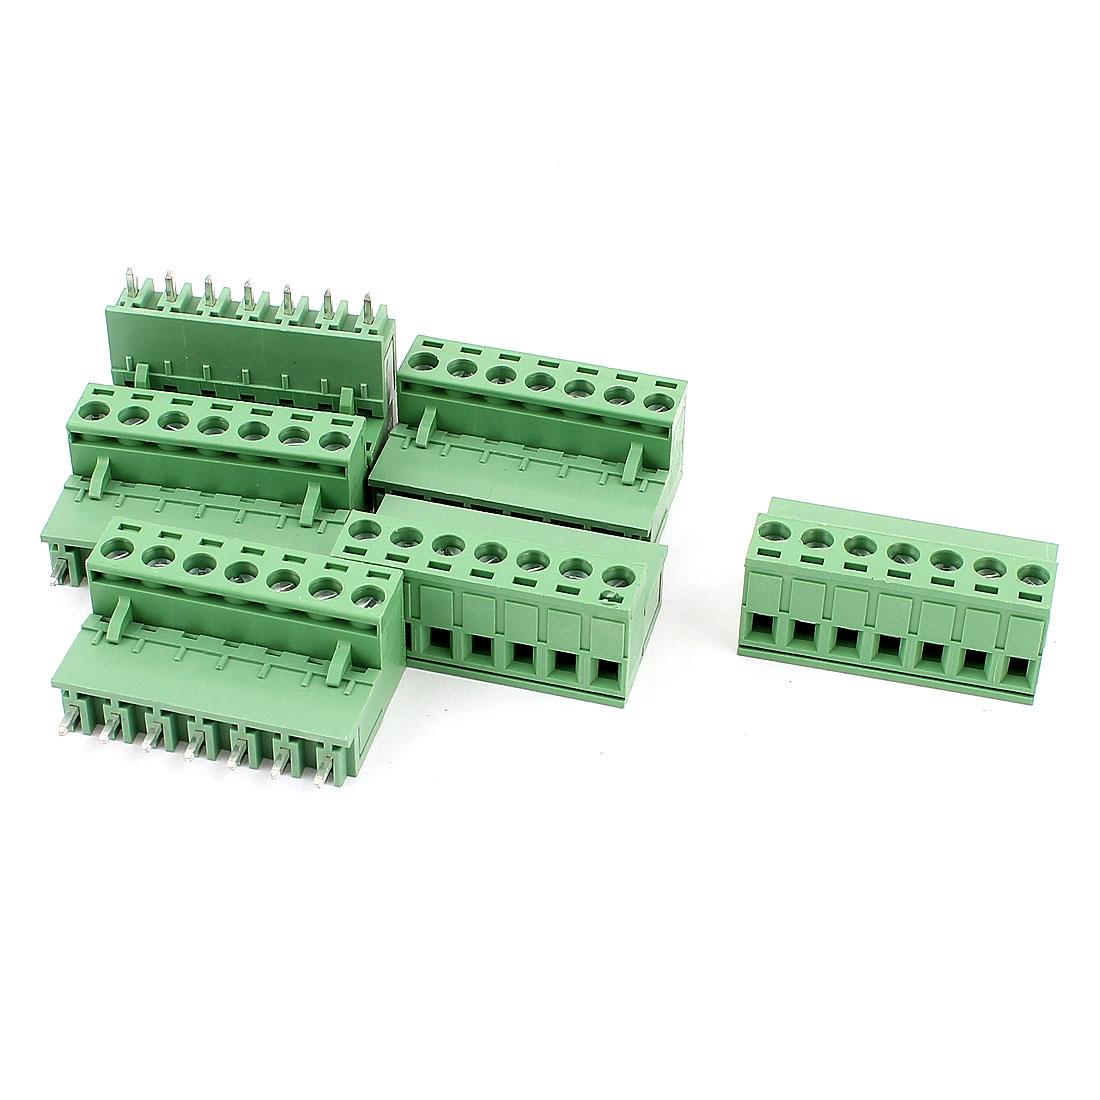 6 Pcs AC 300V 10A 7 Pins PCB Screw Terminal Block Connector 5.08mm Pitch Green